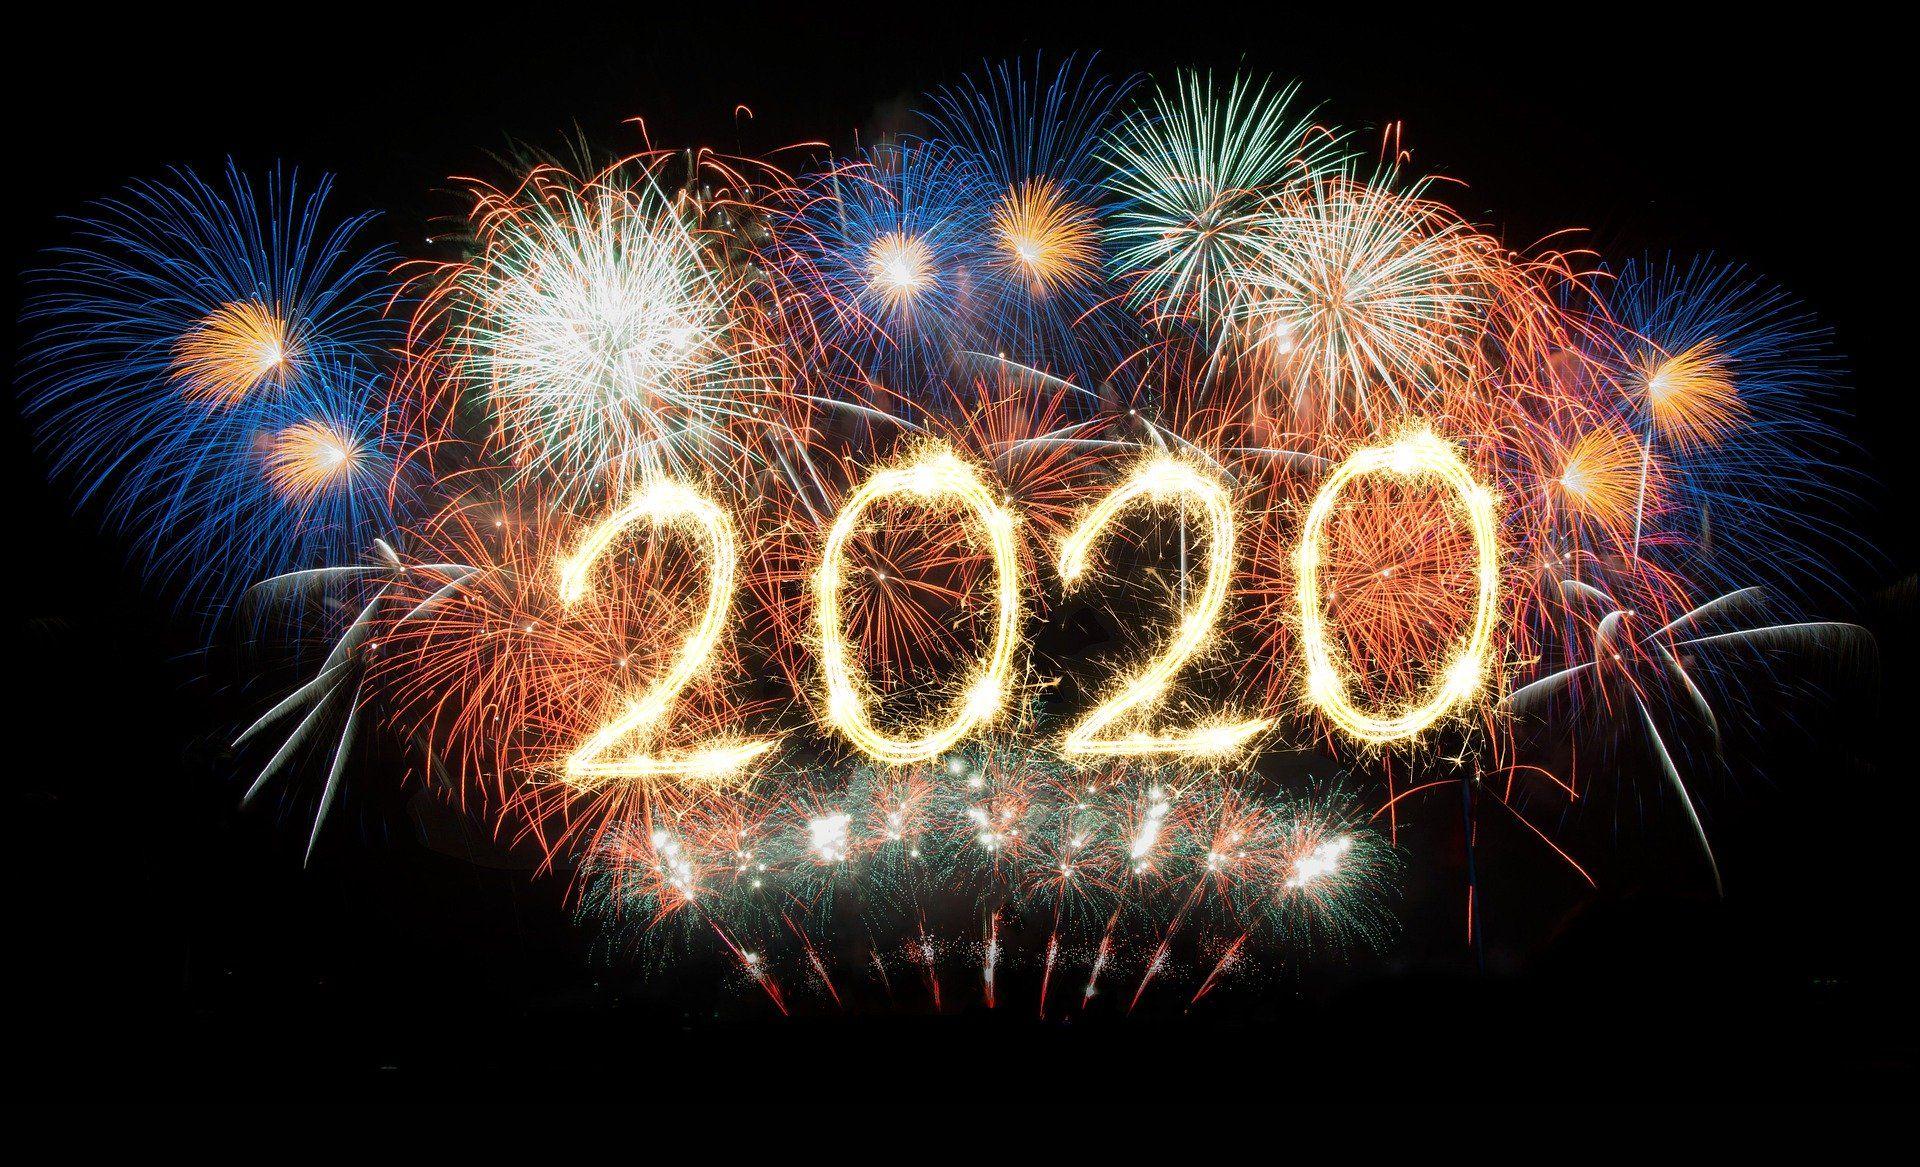 Lustige Silvester Bilder 2021